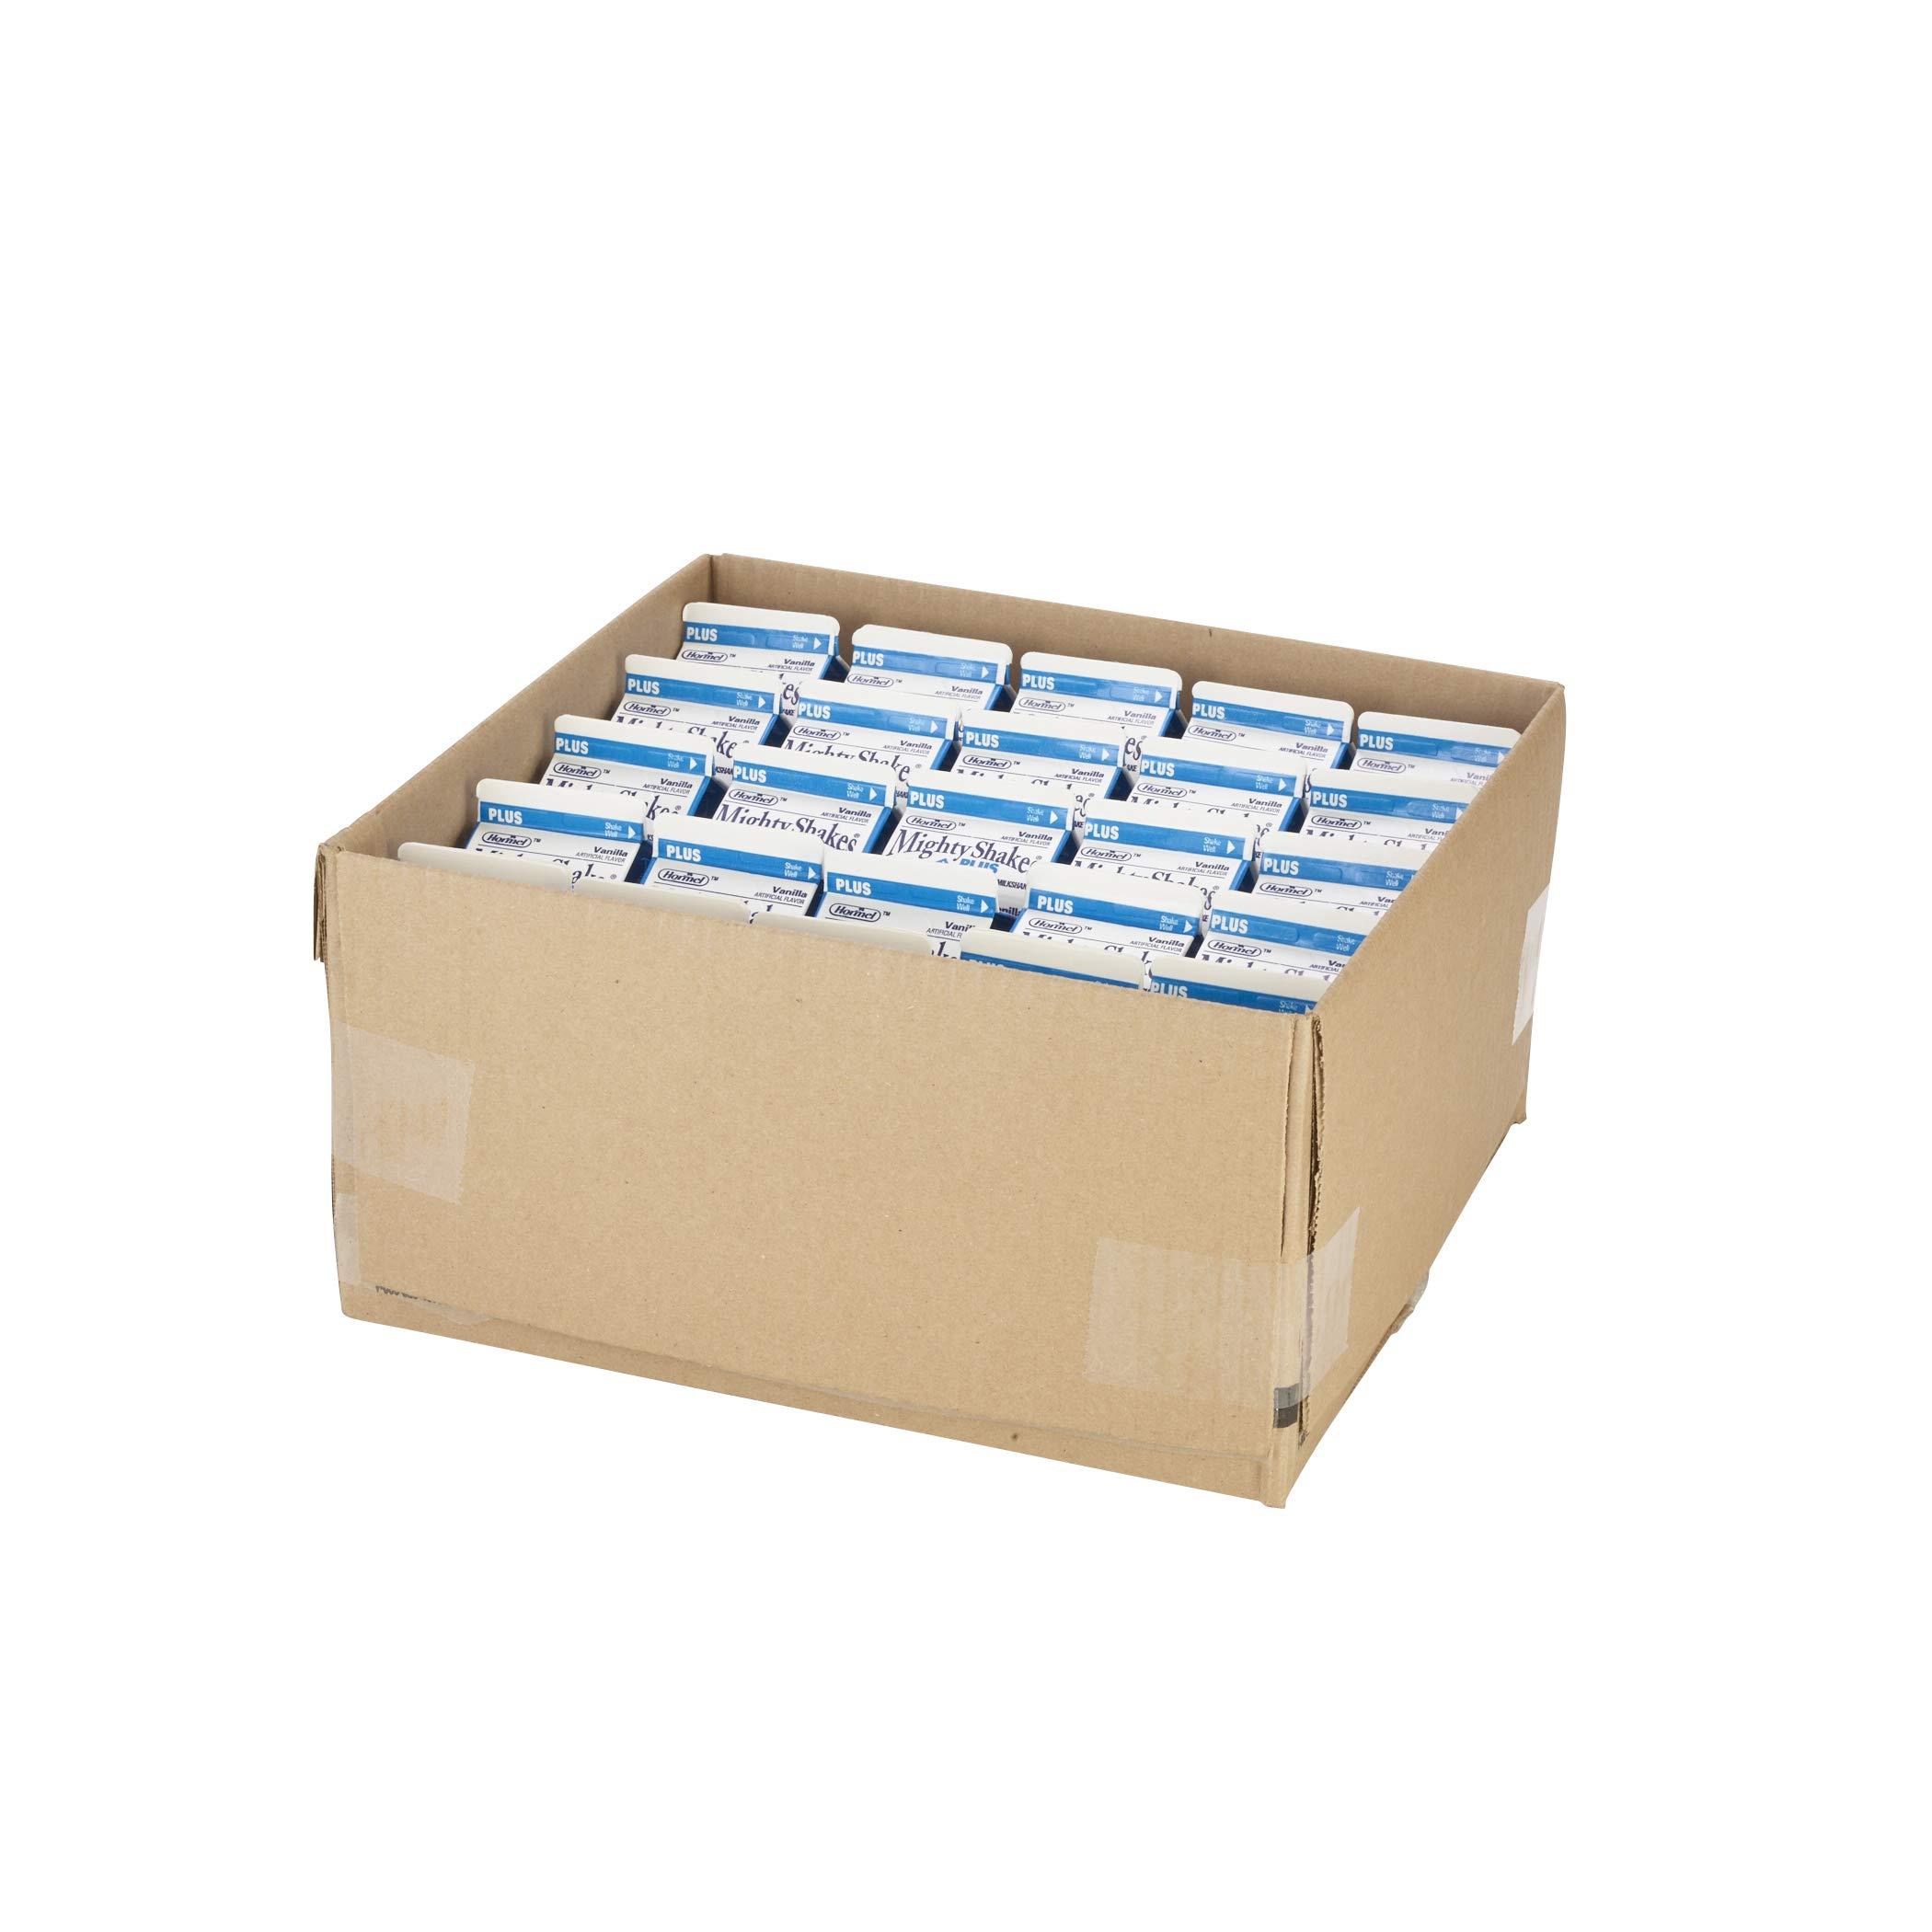 MightShakes Beverage (4 oz Pack of 50, Vanilla Plus) by Hormel Healthlabs (Image #3)